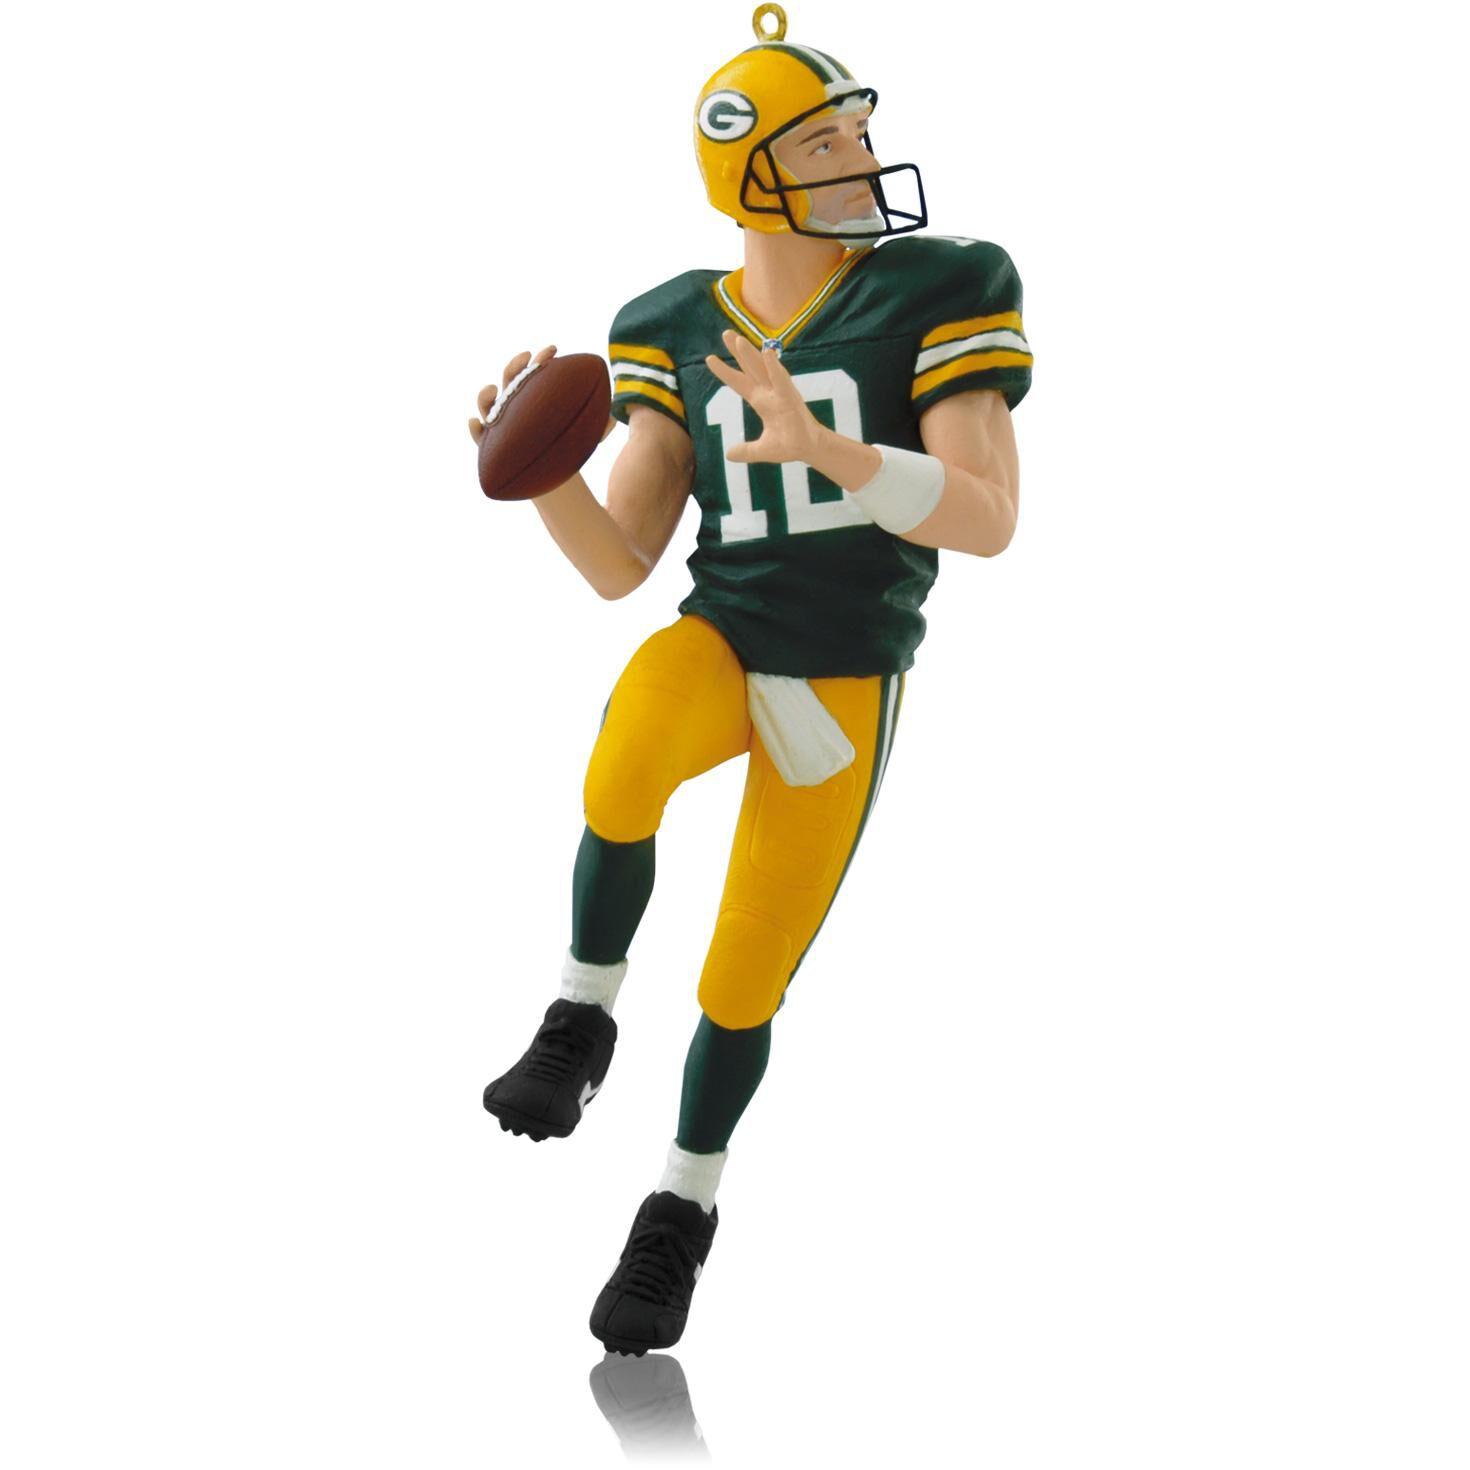 Football player ornament - Football Player Ornament 2